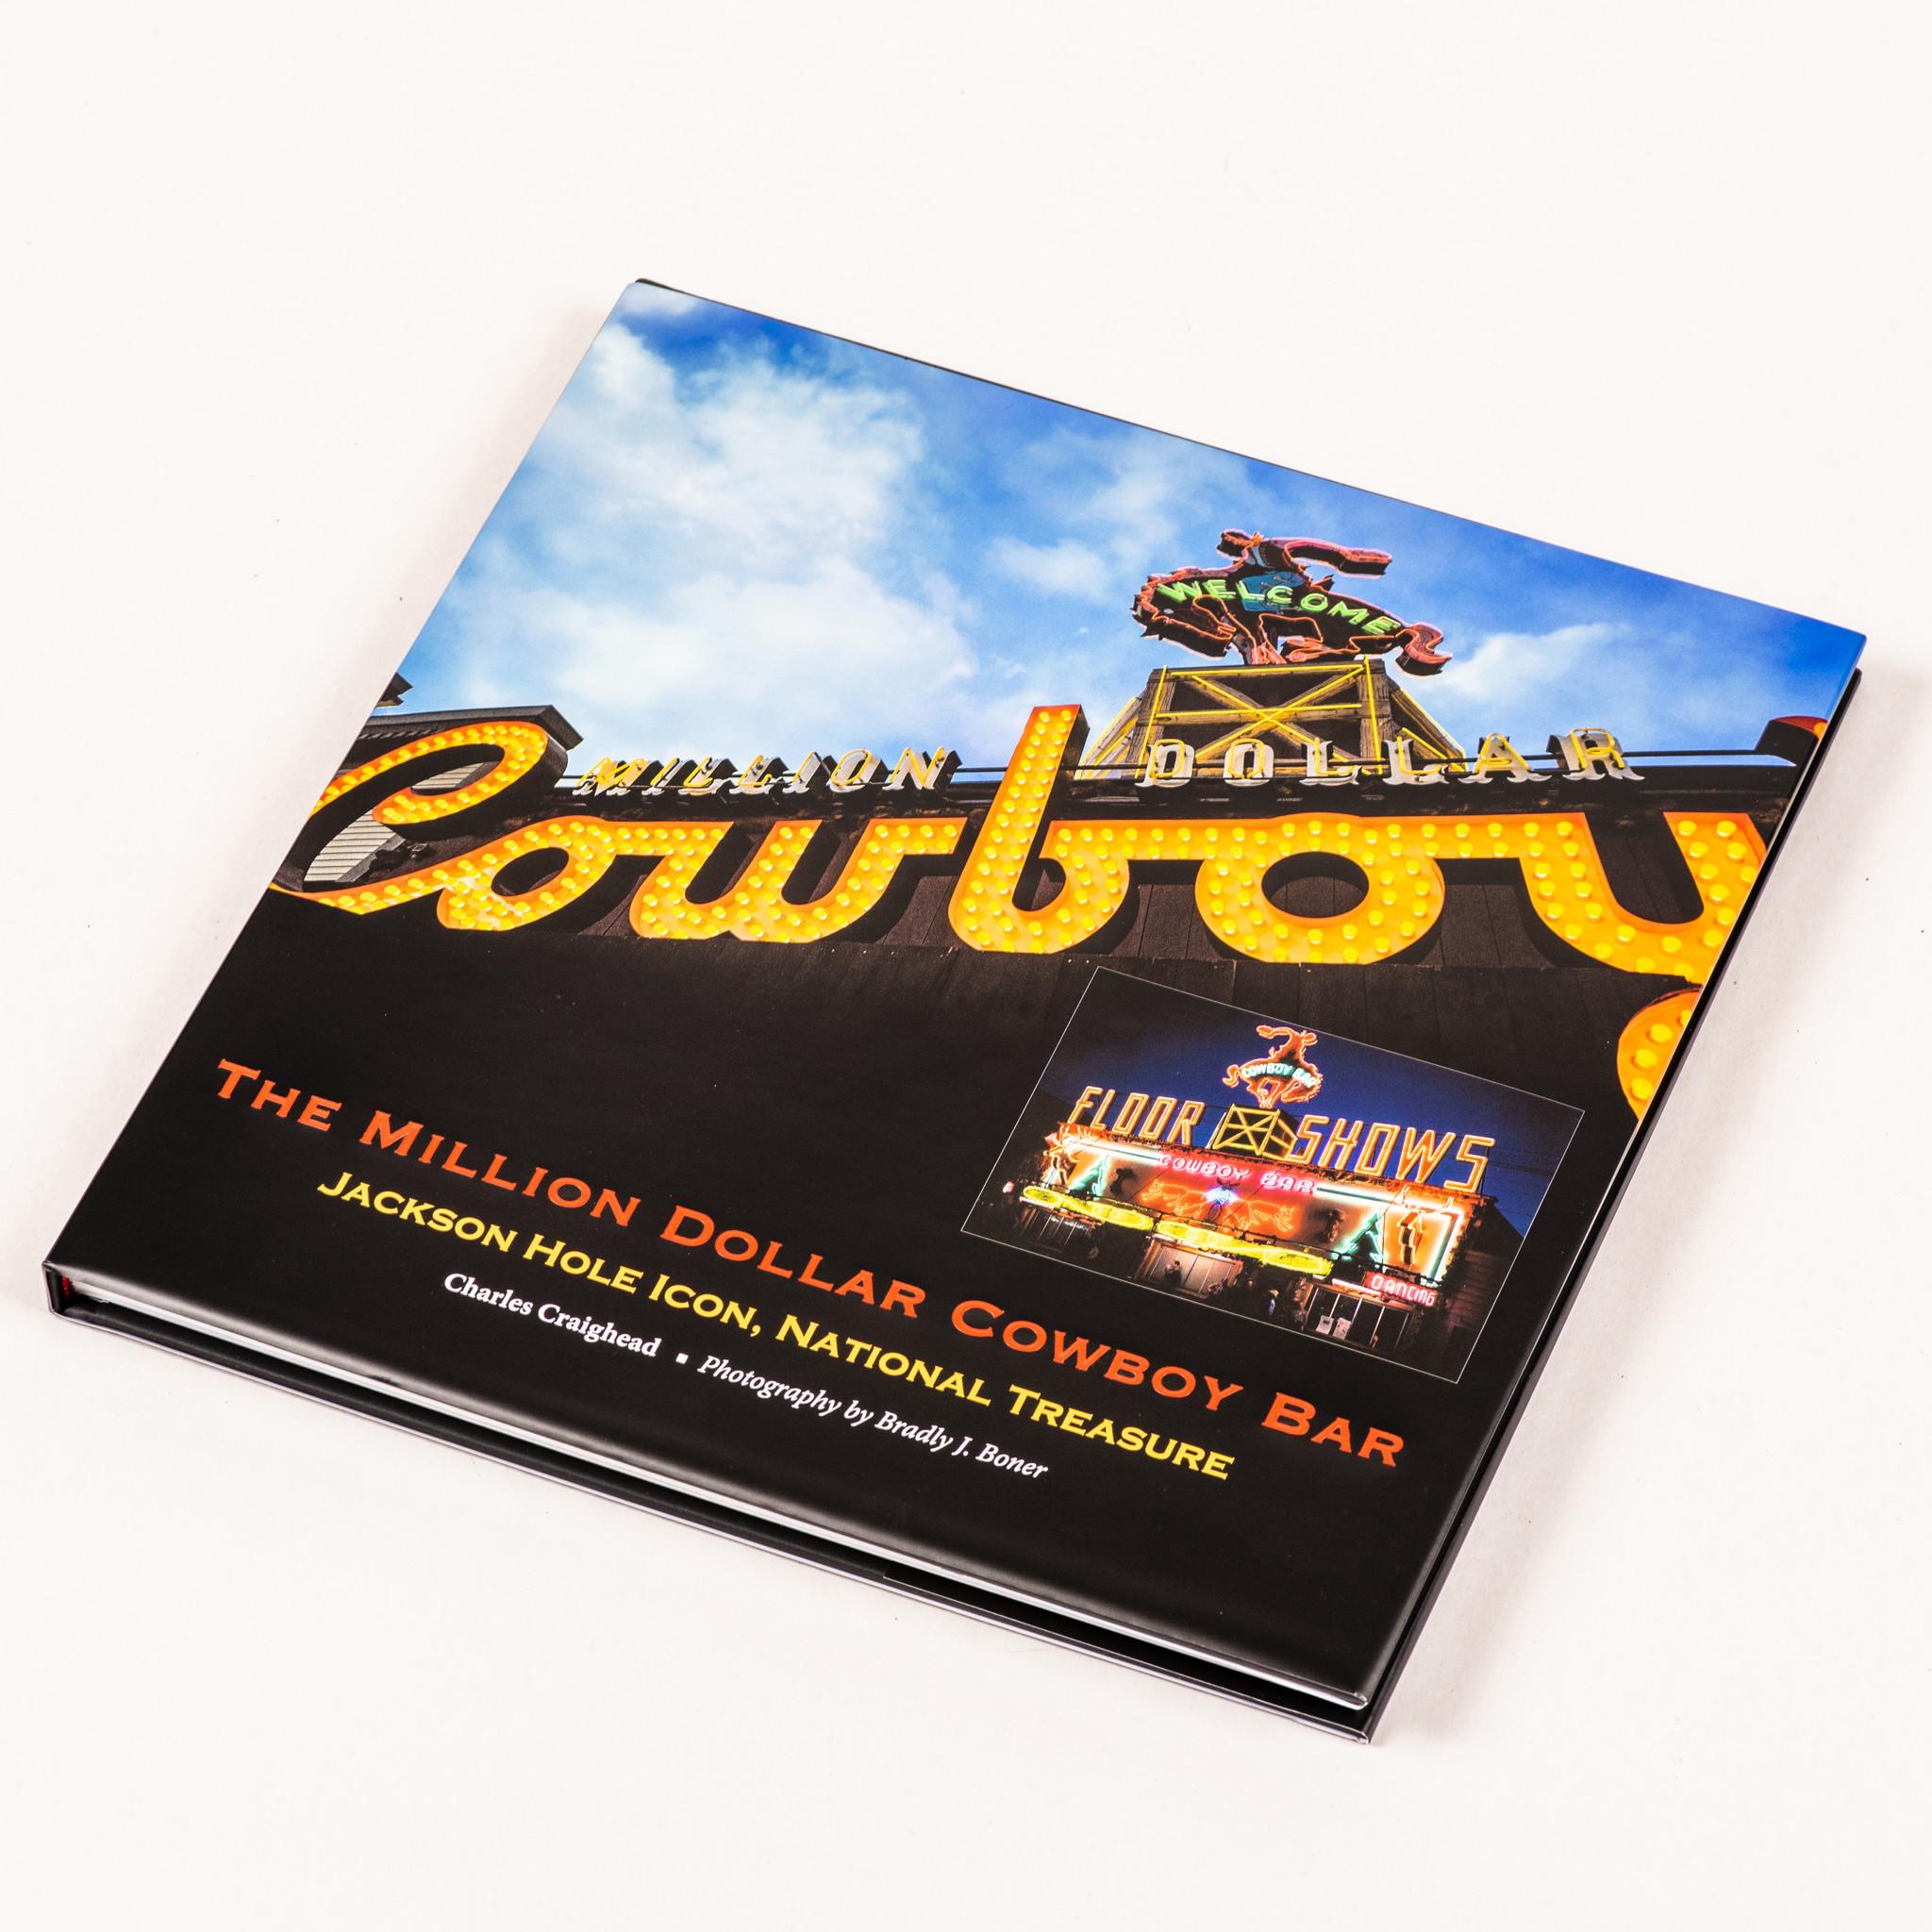 Million Dollar Cowboy Bar Book